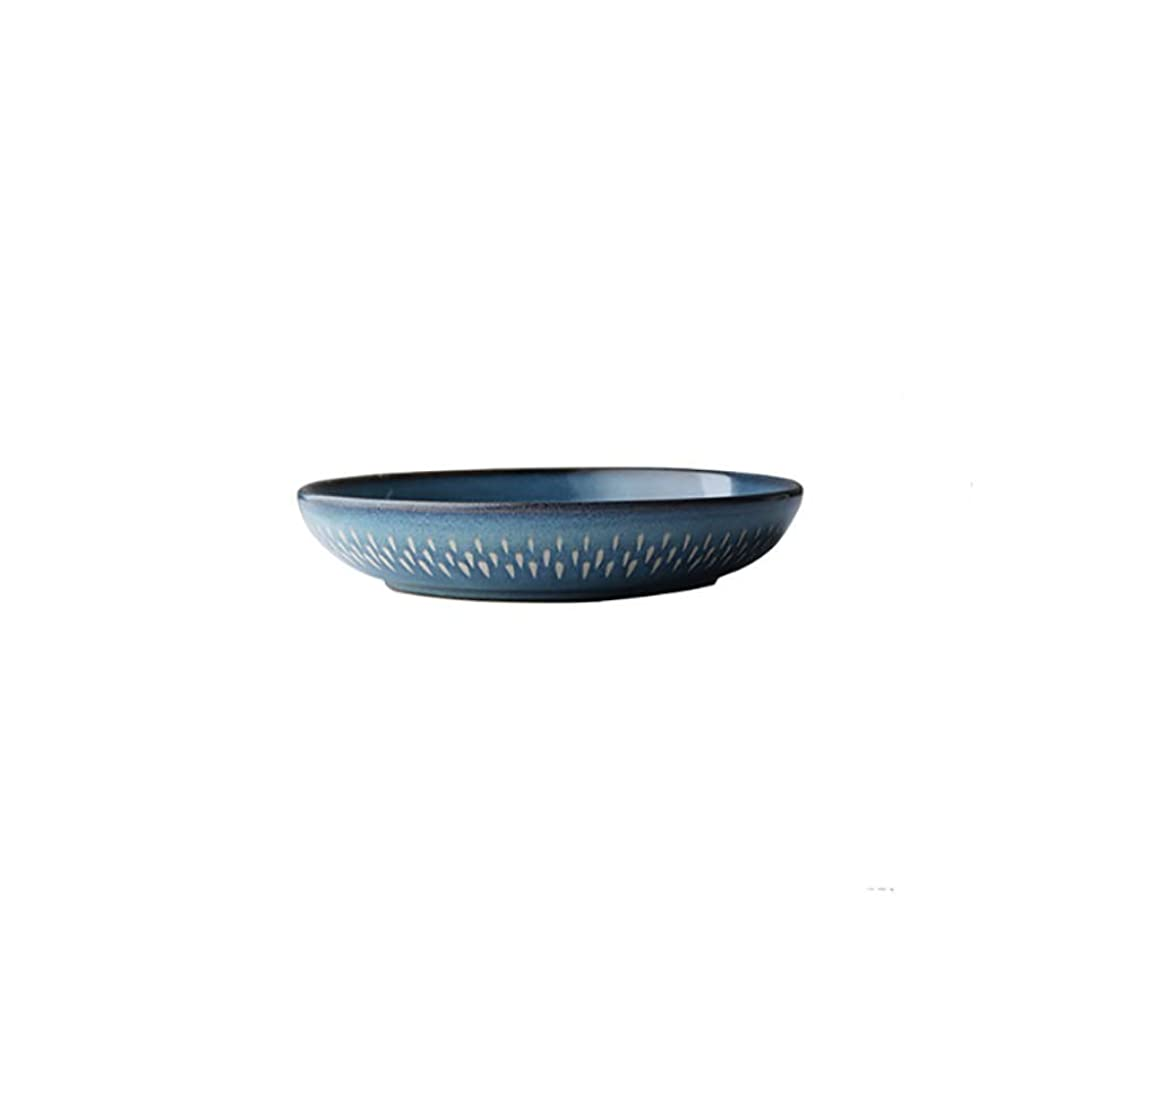 Tableware soup bowl bowl ceramic mixing bowl shallow mouth basin large soup bowl dish home salad bowl salad plate (Color : 1PCS)